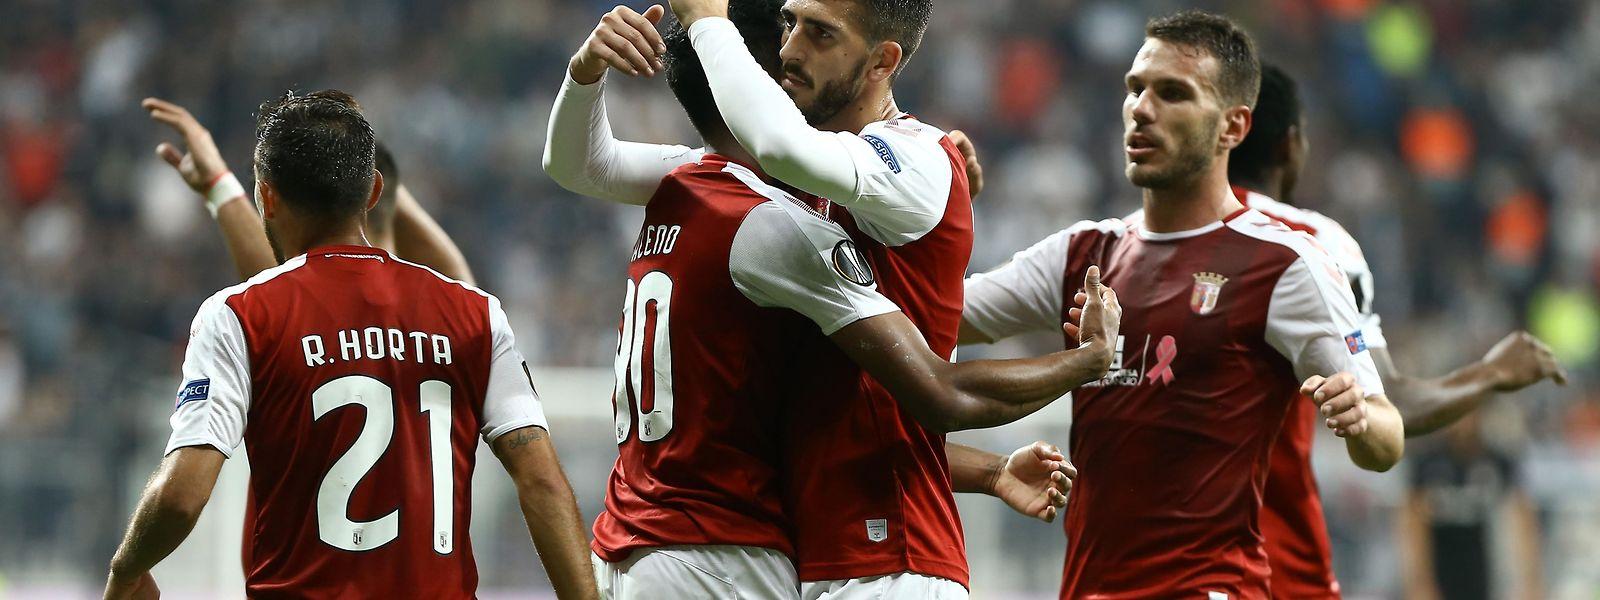 A vitória do Braga na Turquia.